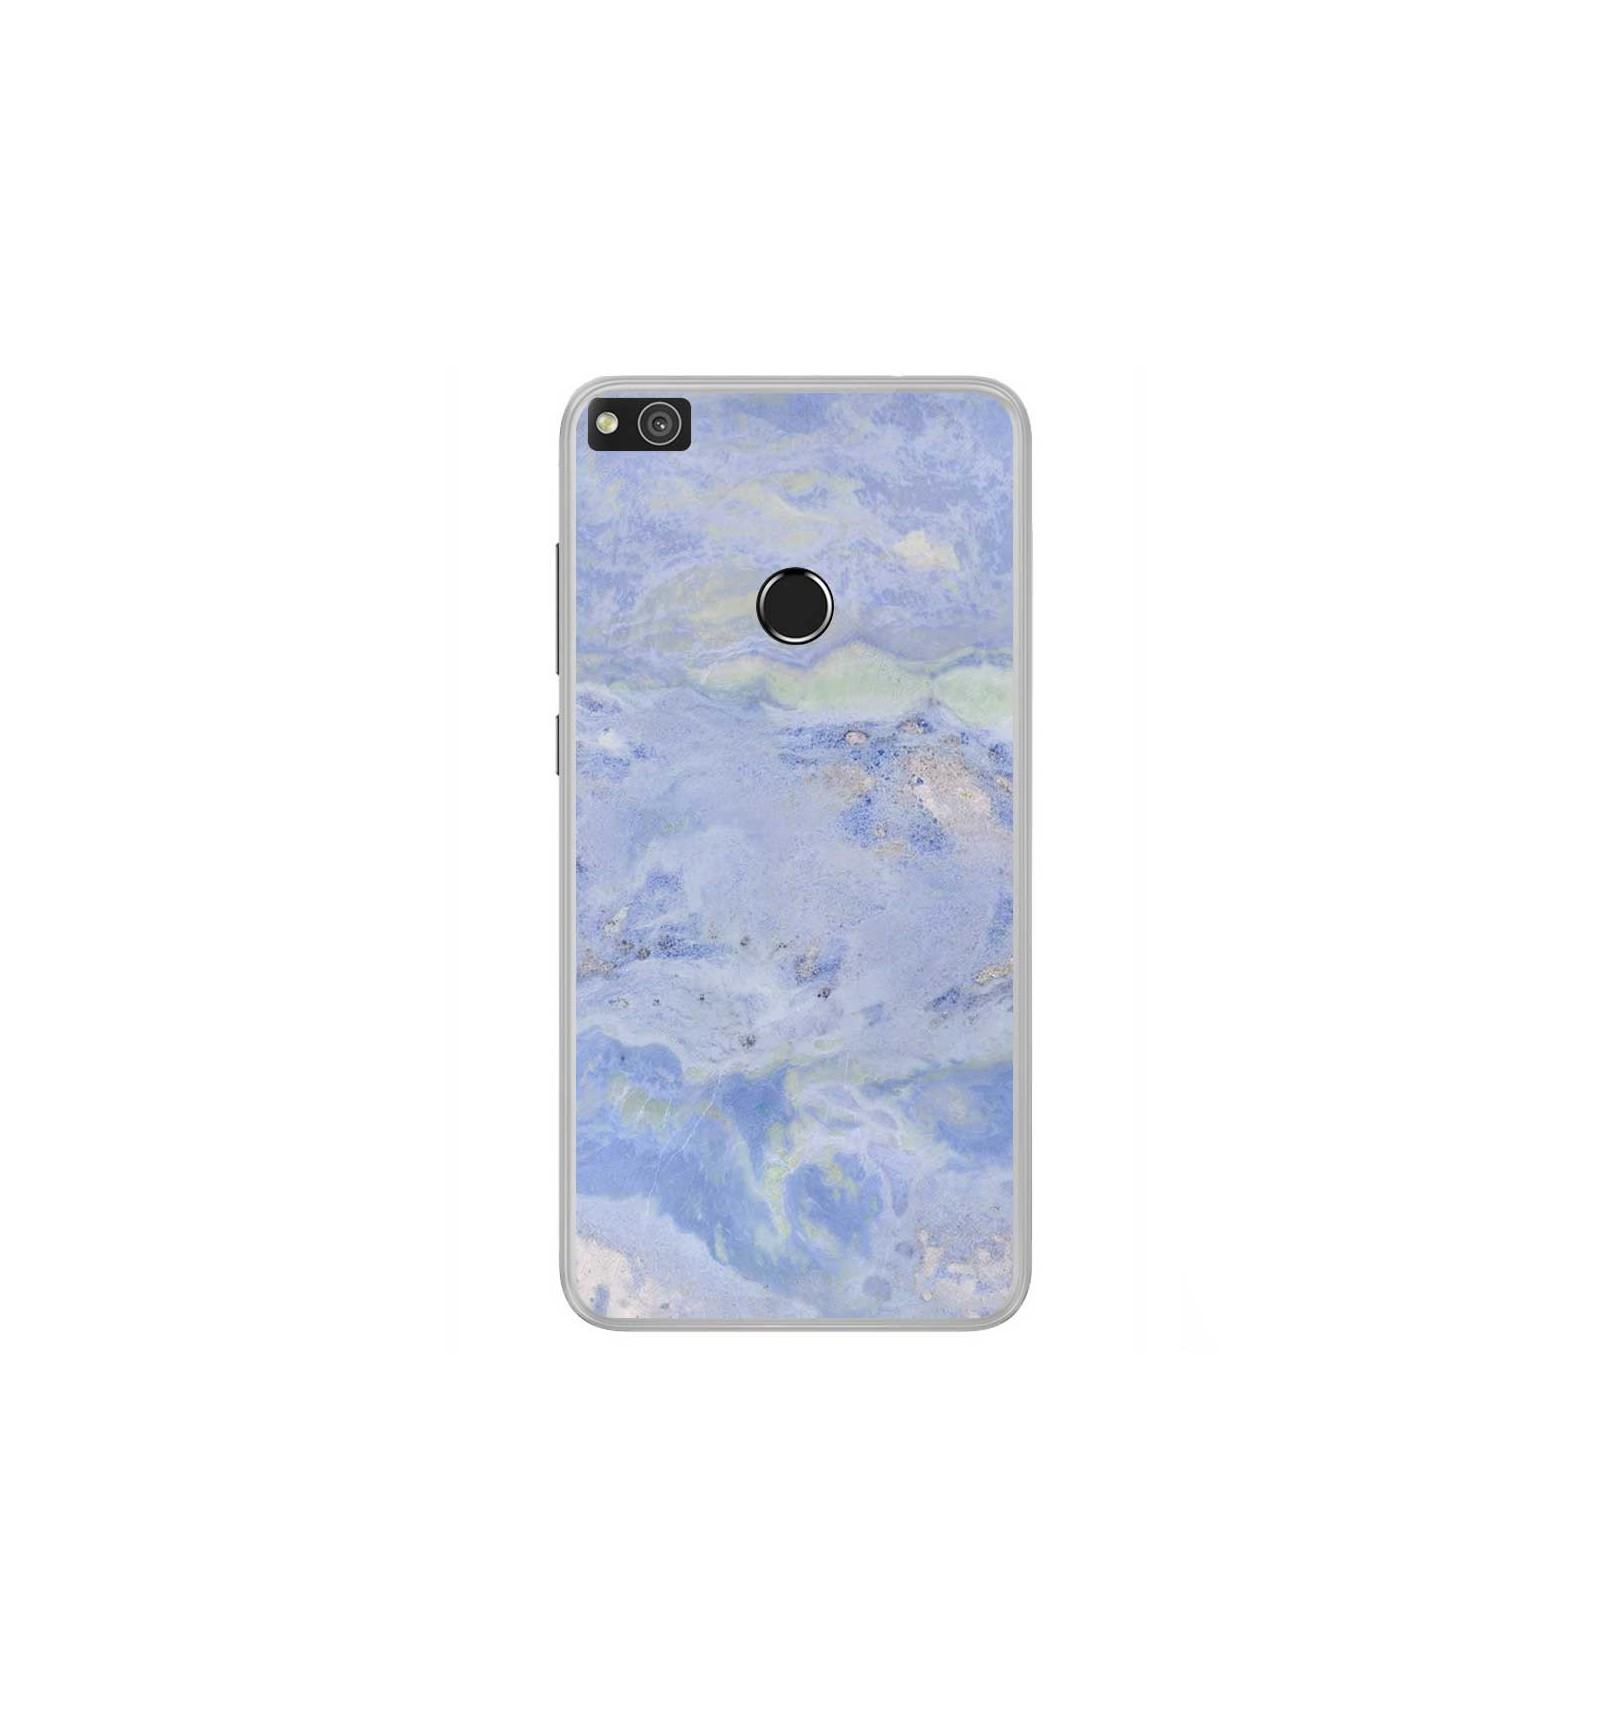 coque huawei p8 lite 2017 motif marbrer